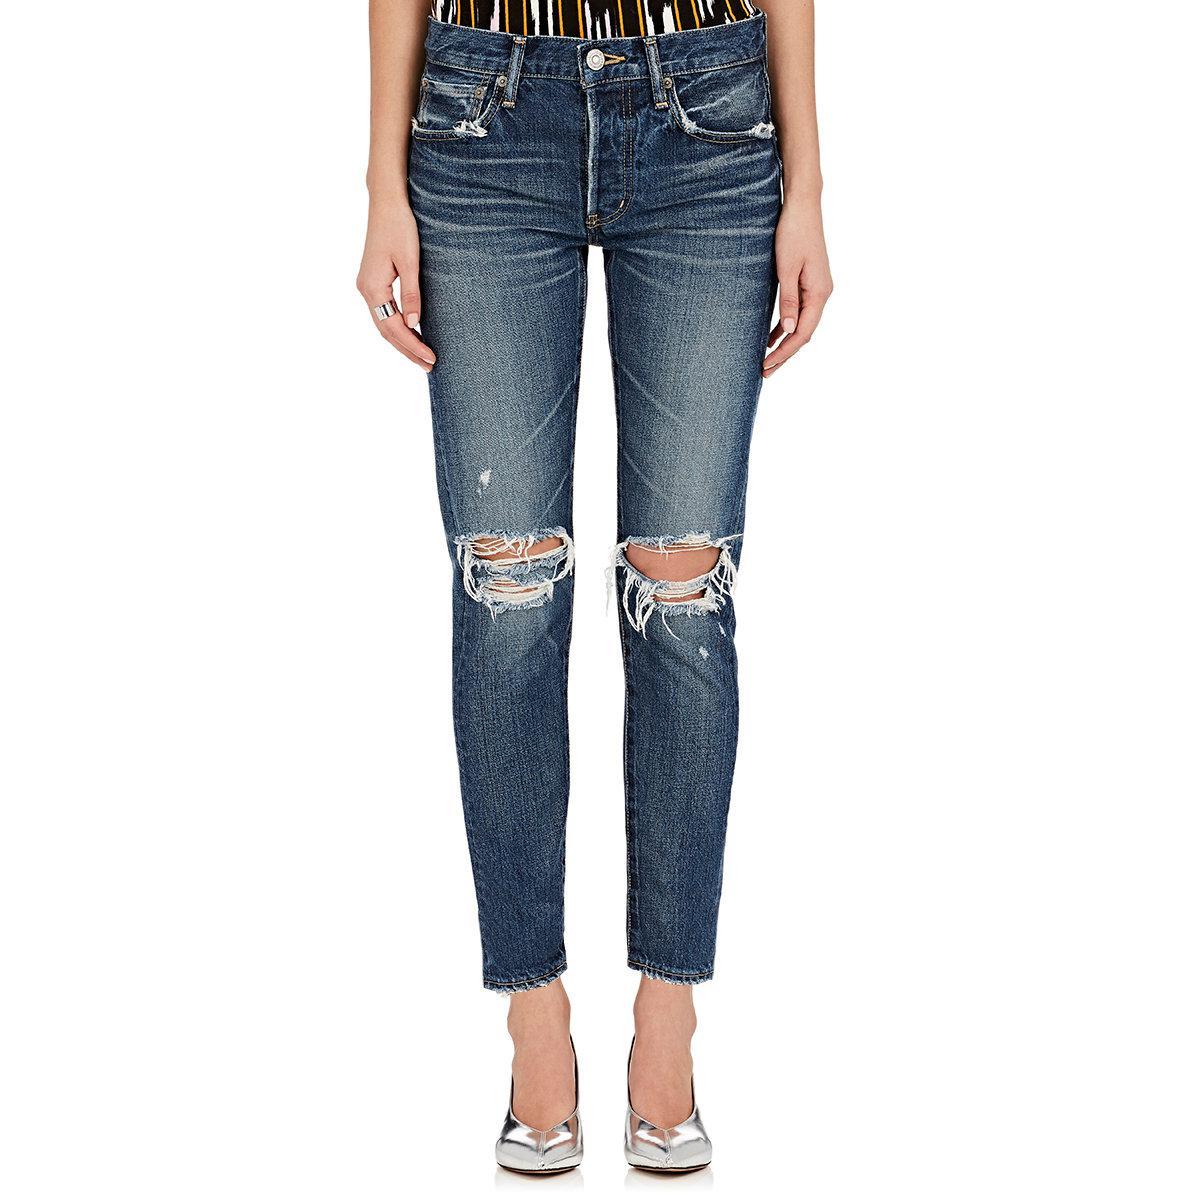 Womens Latrobe Distressed Tapered Jeans Moussy 2lzKj